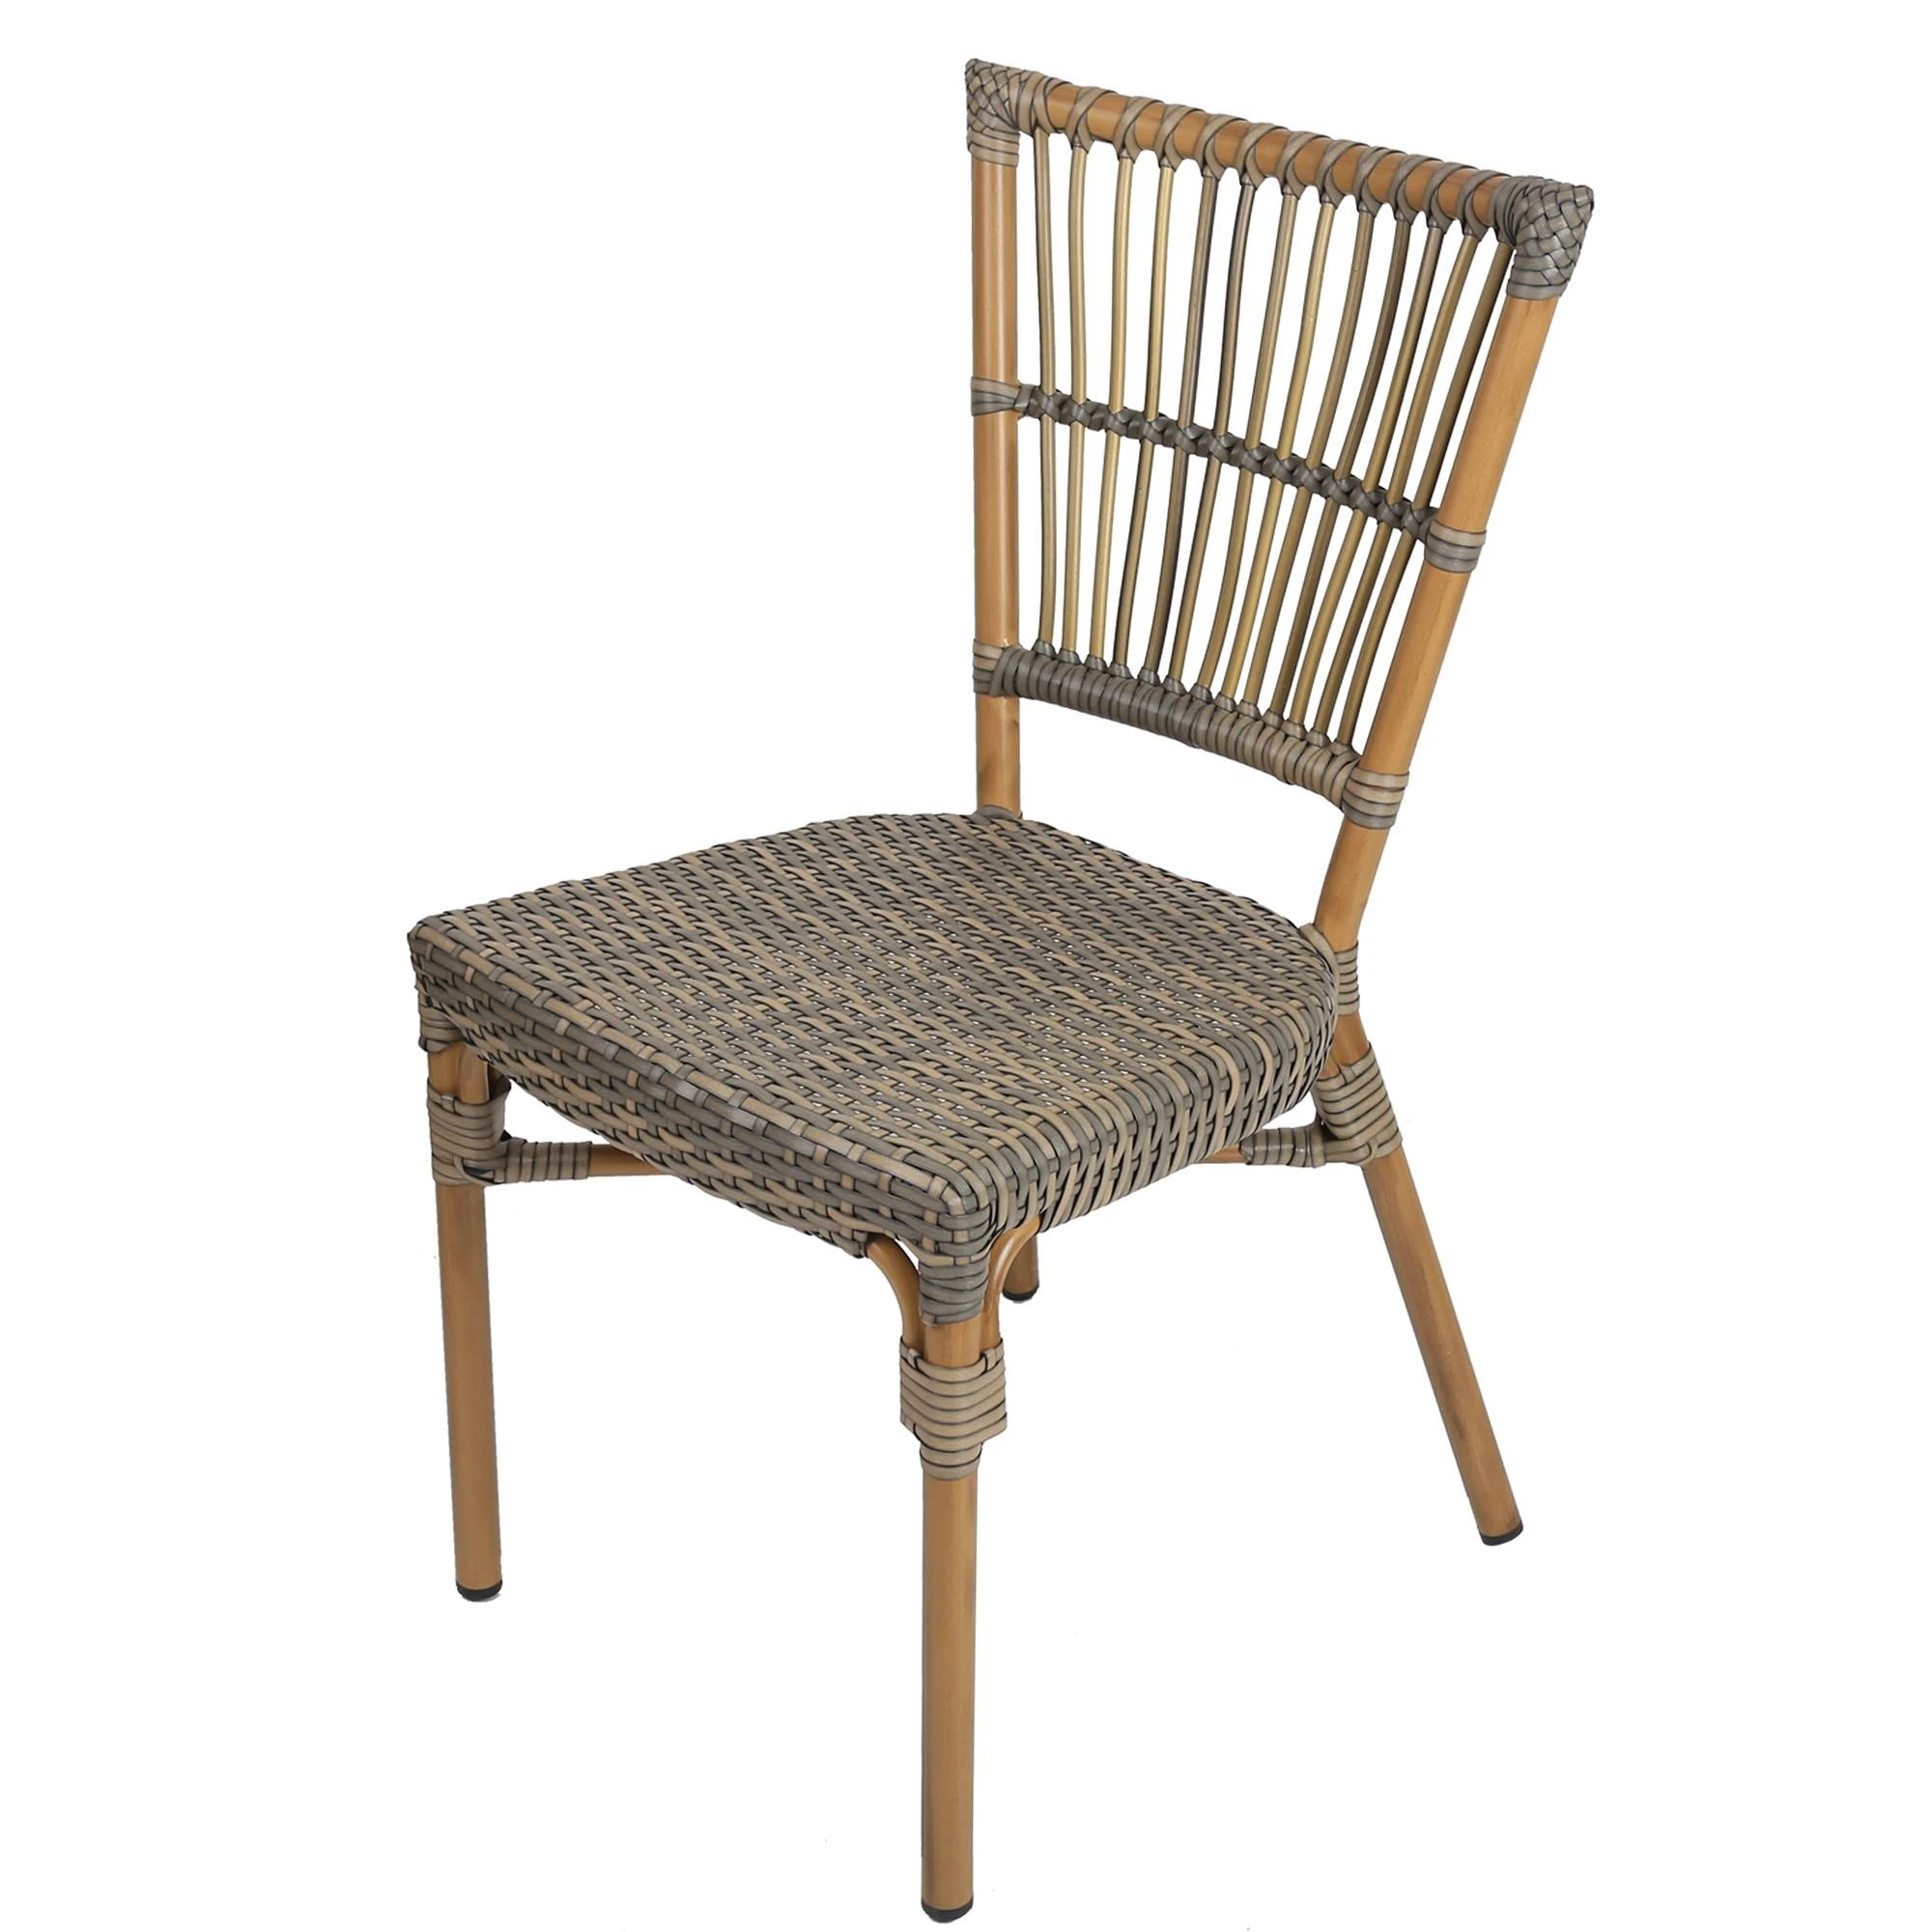 2 Piece Patio Rattan Wicker Chair Indoor Outdoor Use Garden Lawn Backyard Bistro Cafe Stack Chair All Weather Resistant Garden Chairs Aliexpress